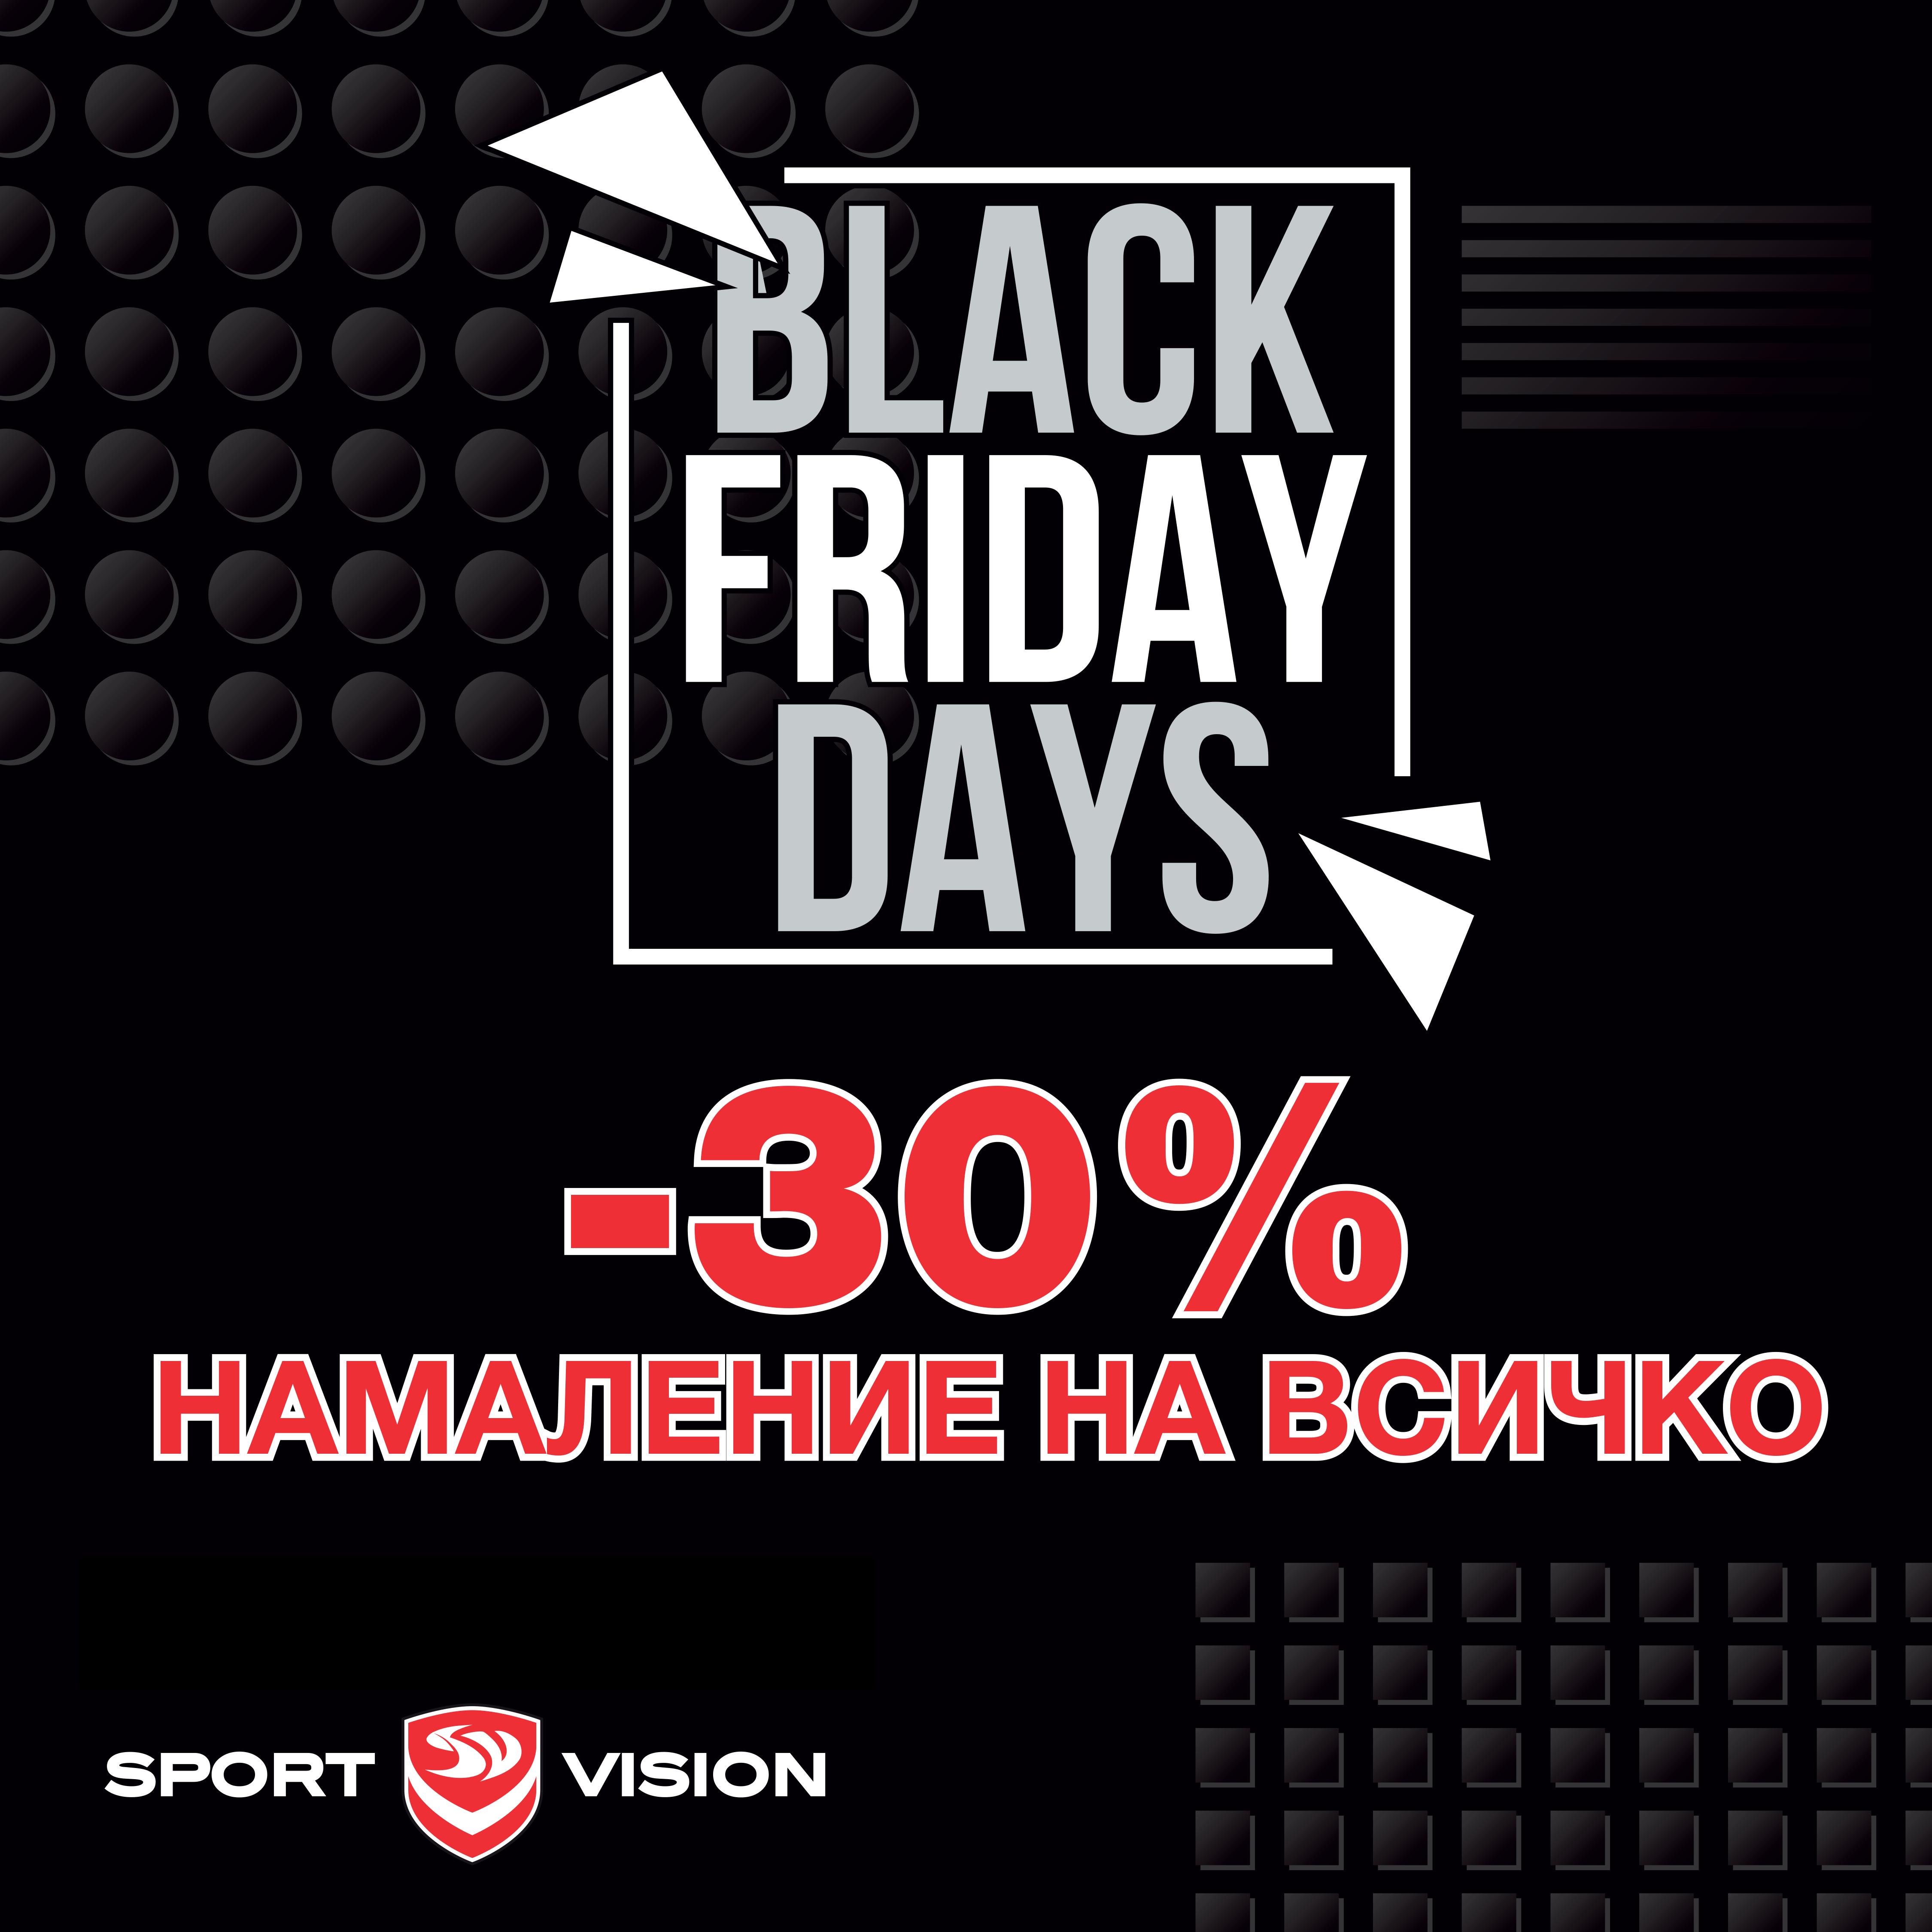 Black friday days в Sport Vision!